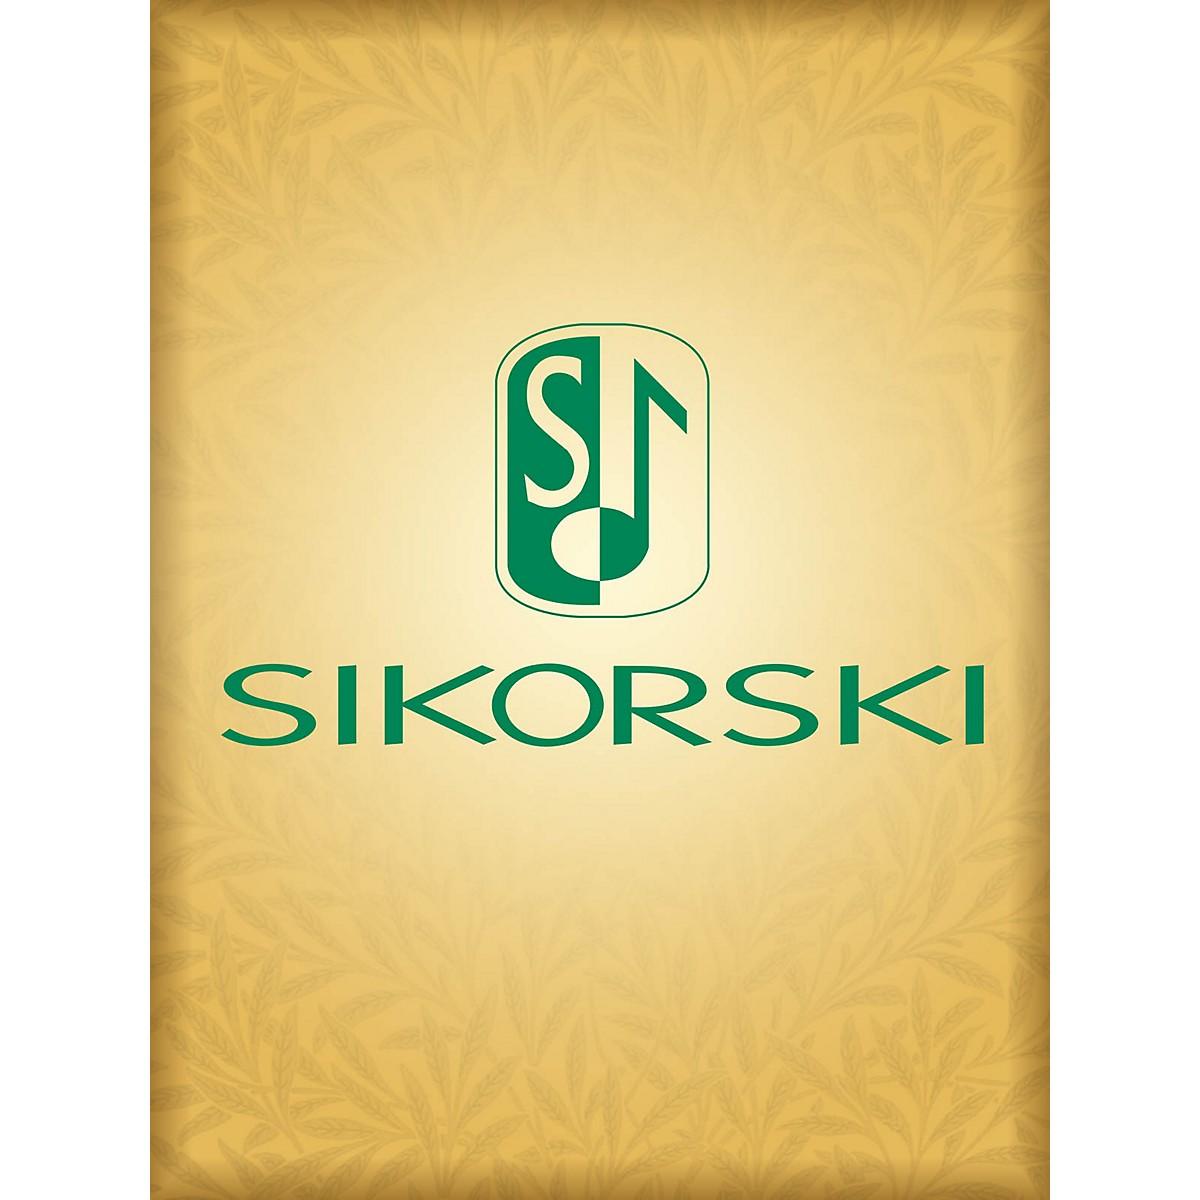 Sikorski Violin Concerto (Study Score) Study Score Series Composed by Aram Khachaturian